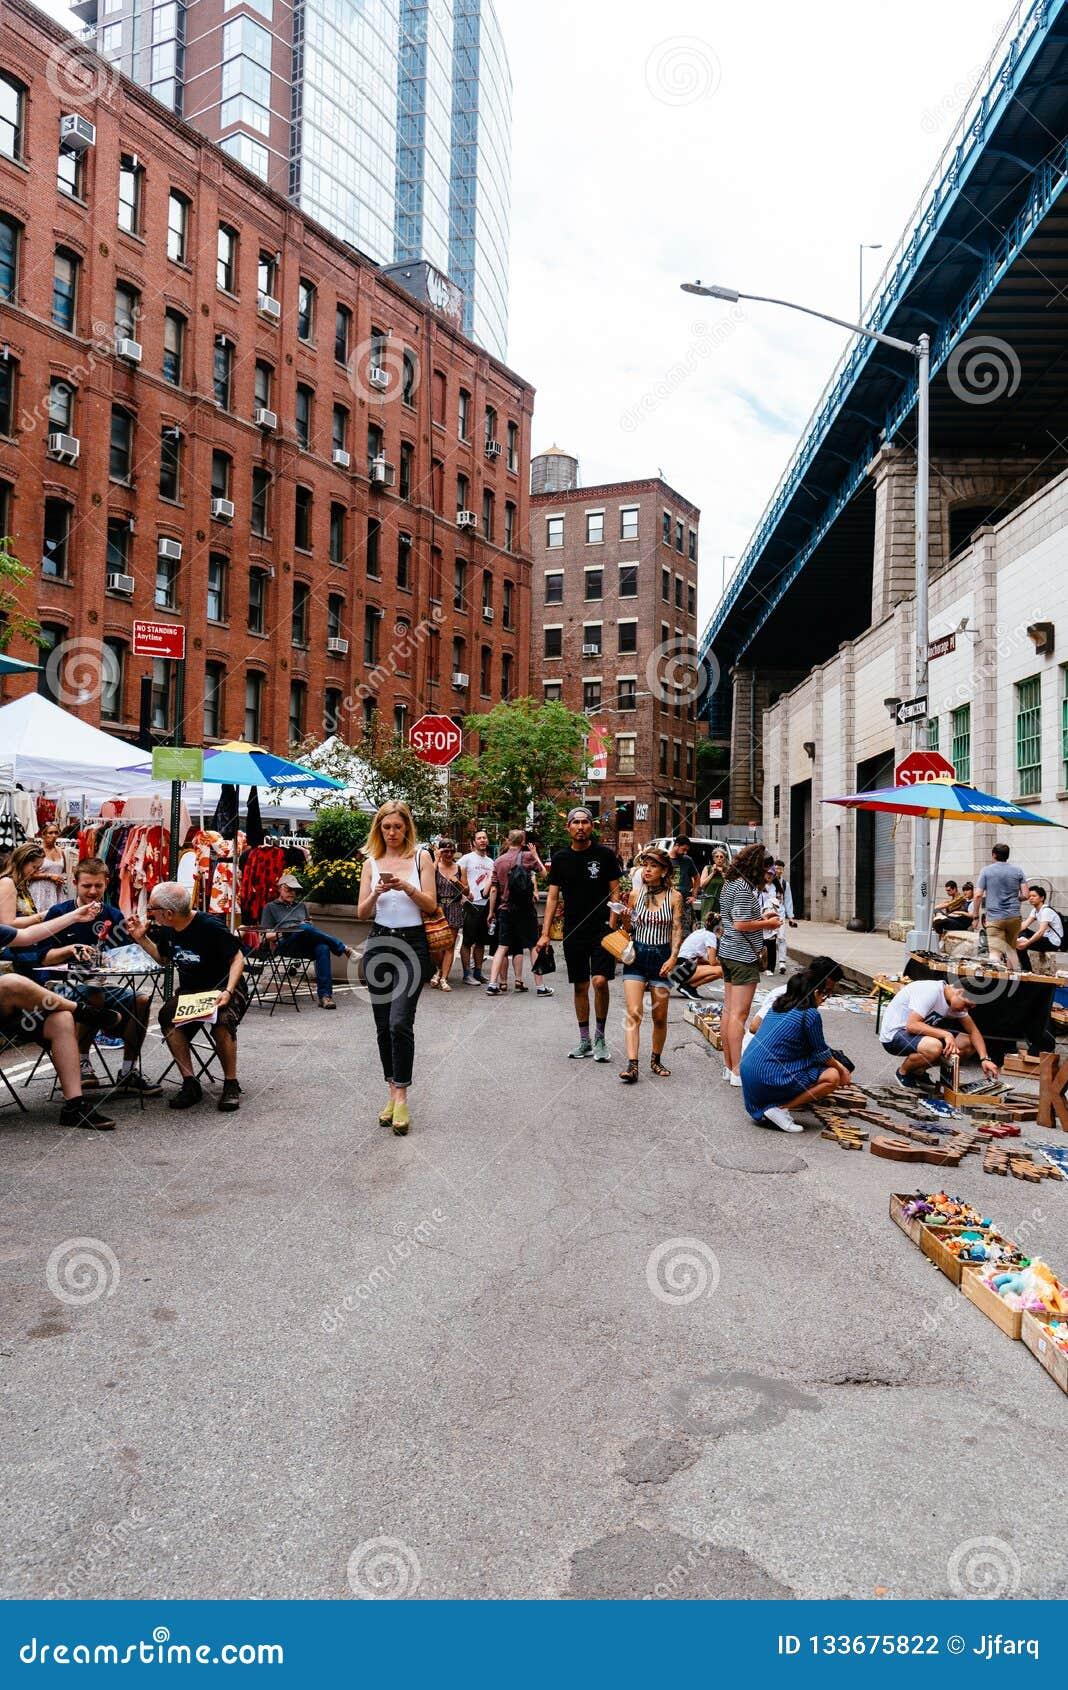 Brooklyn Flea Market In DUMBO In New York Editorial